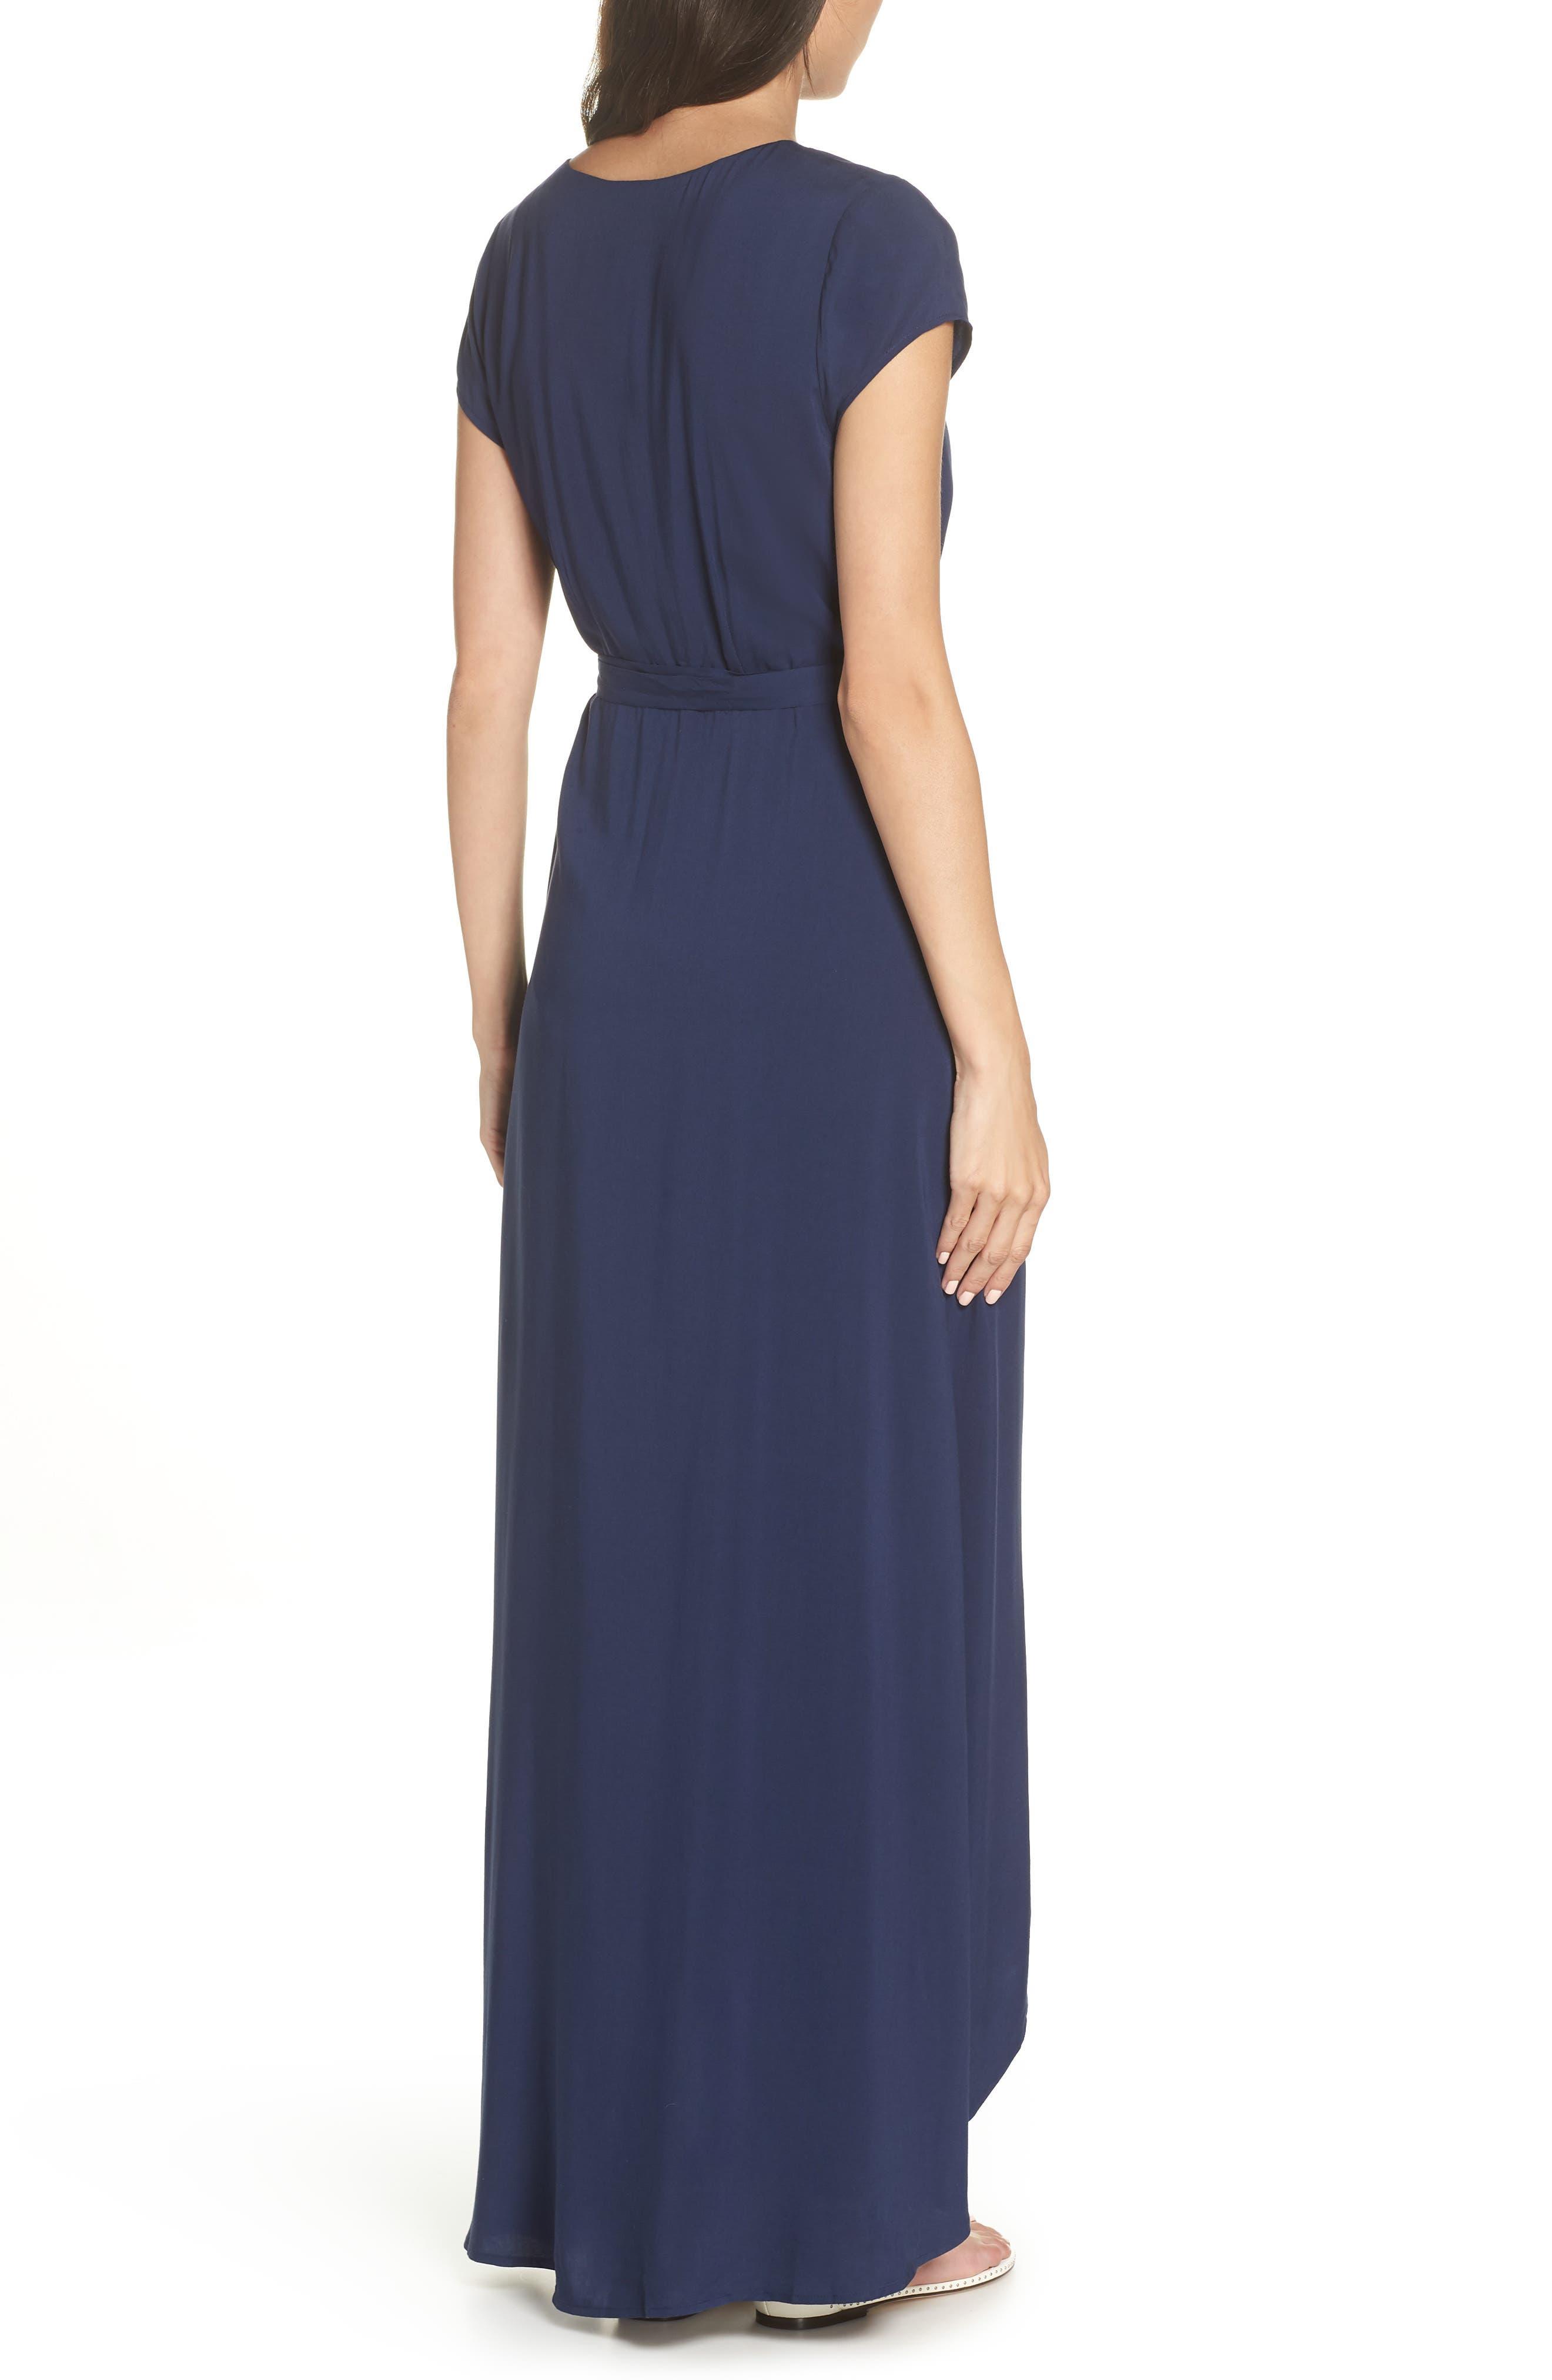 Goa Cover-Up Maxi Wrap Dress,                             Alternate thumbnail 2, color,                             MIDNIGHT BLUE